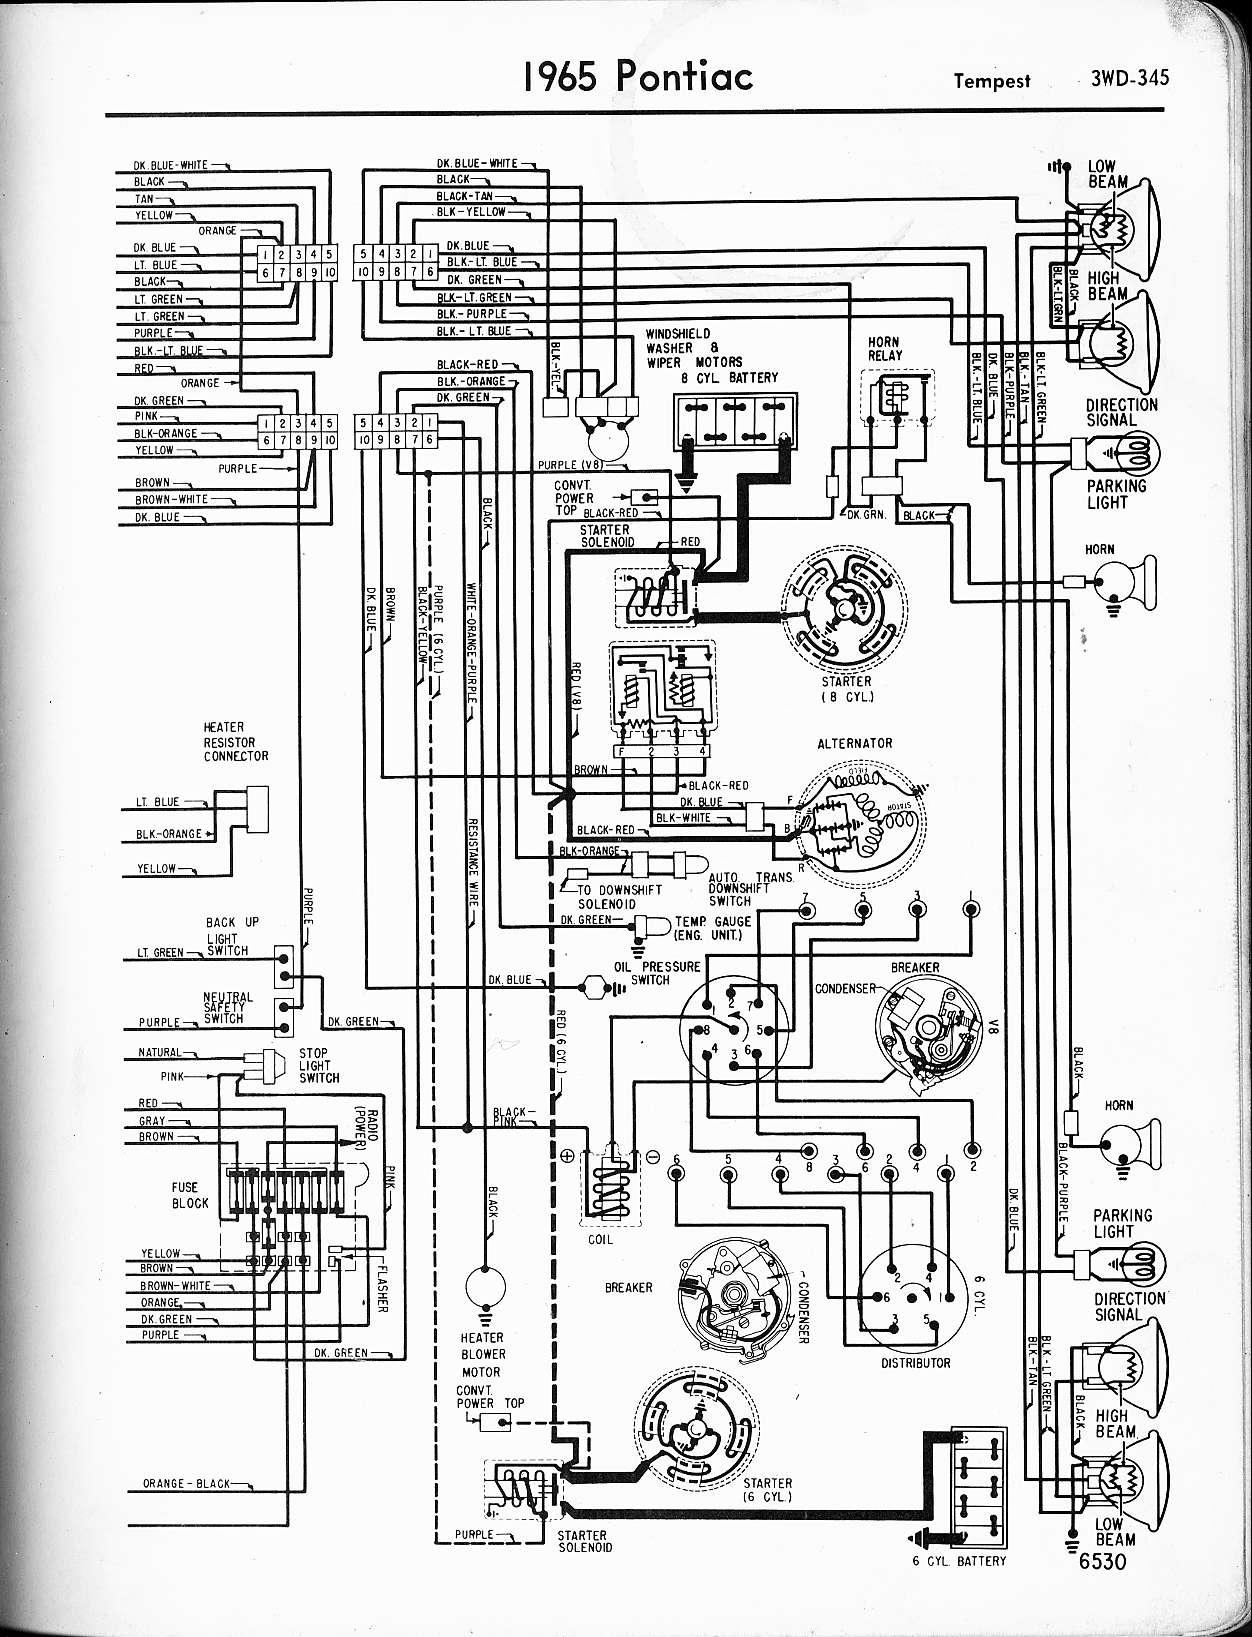 Pontiac Lemans Wiring Diagram